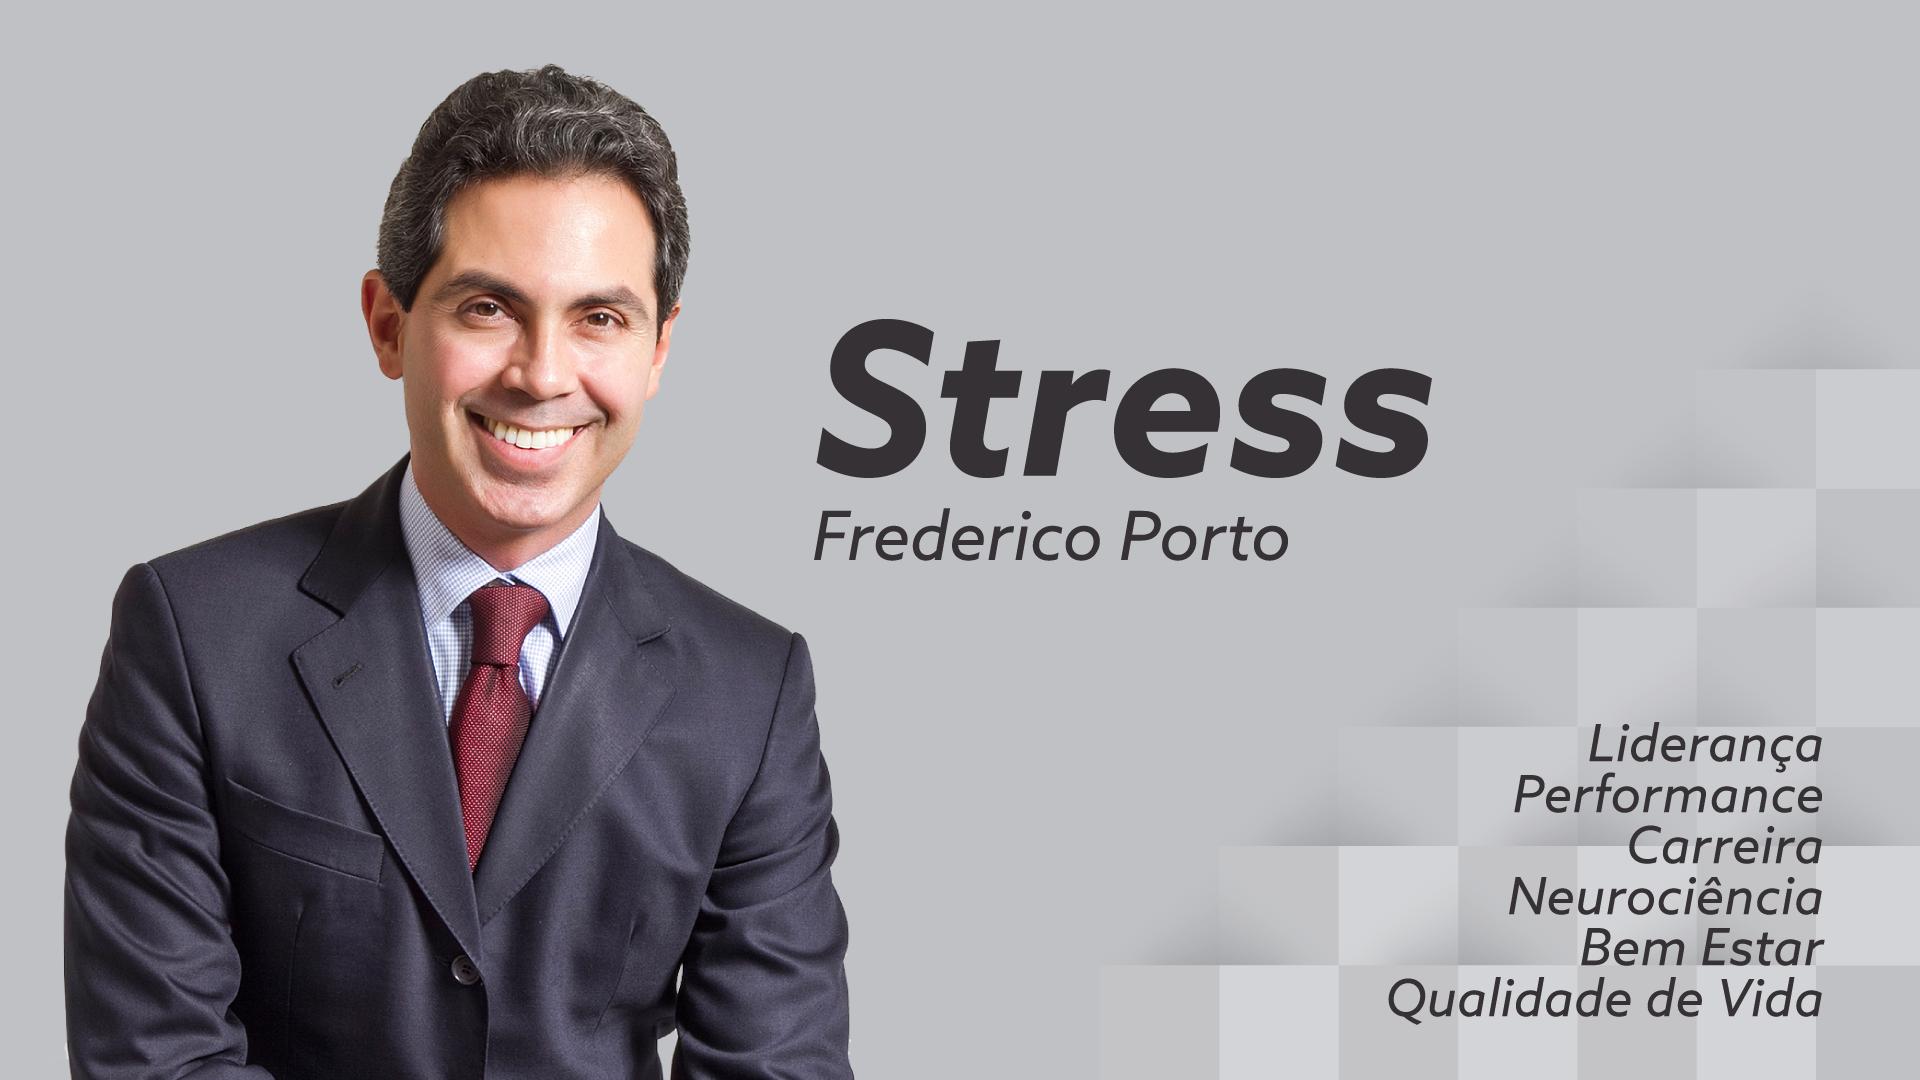 Strees